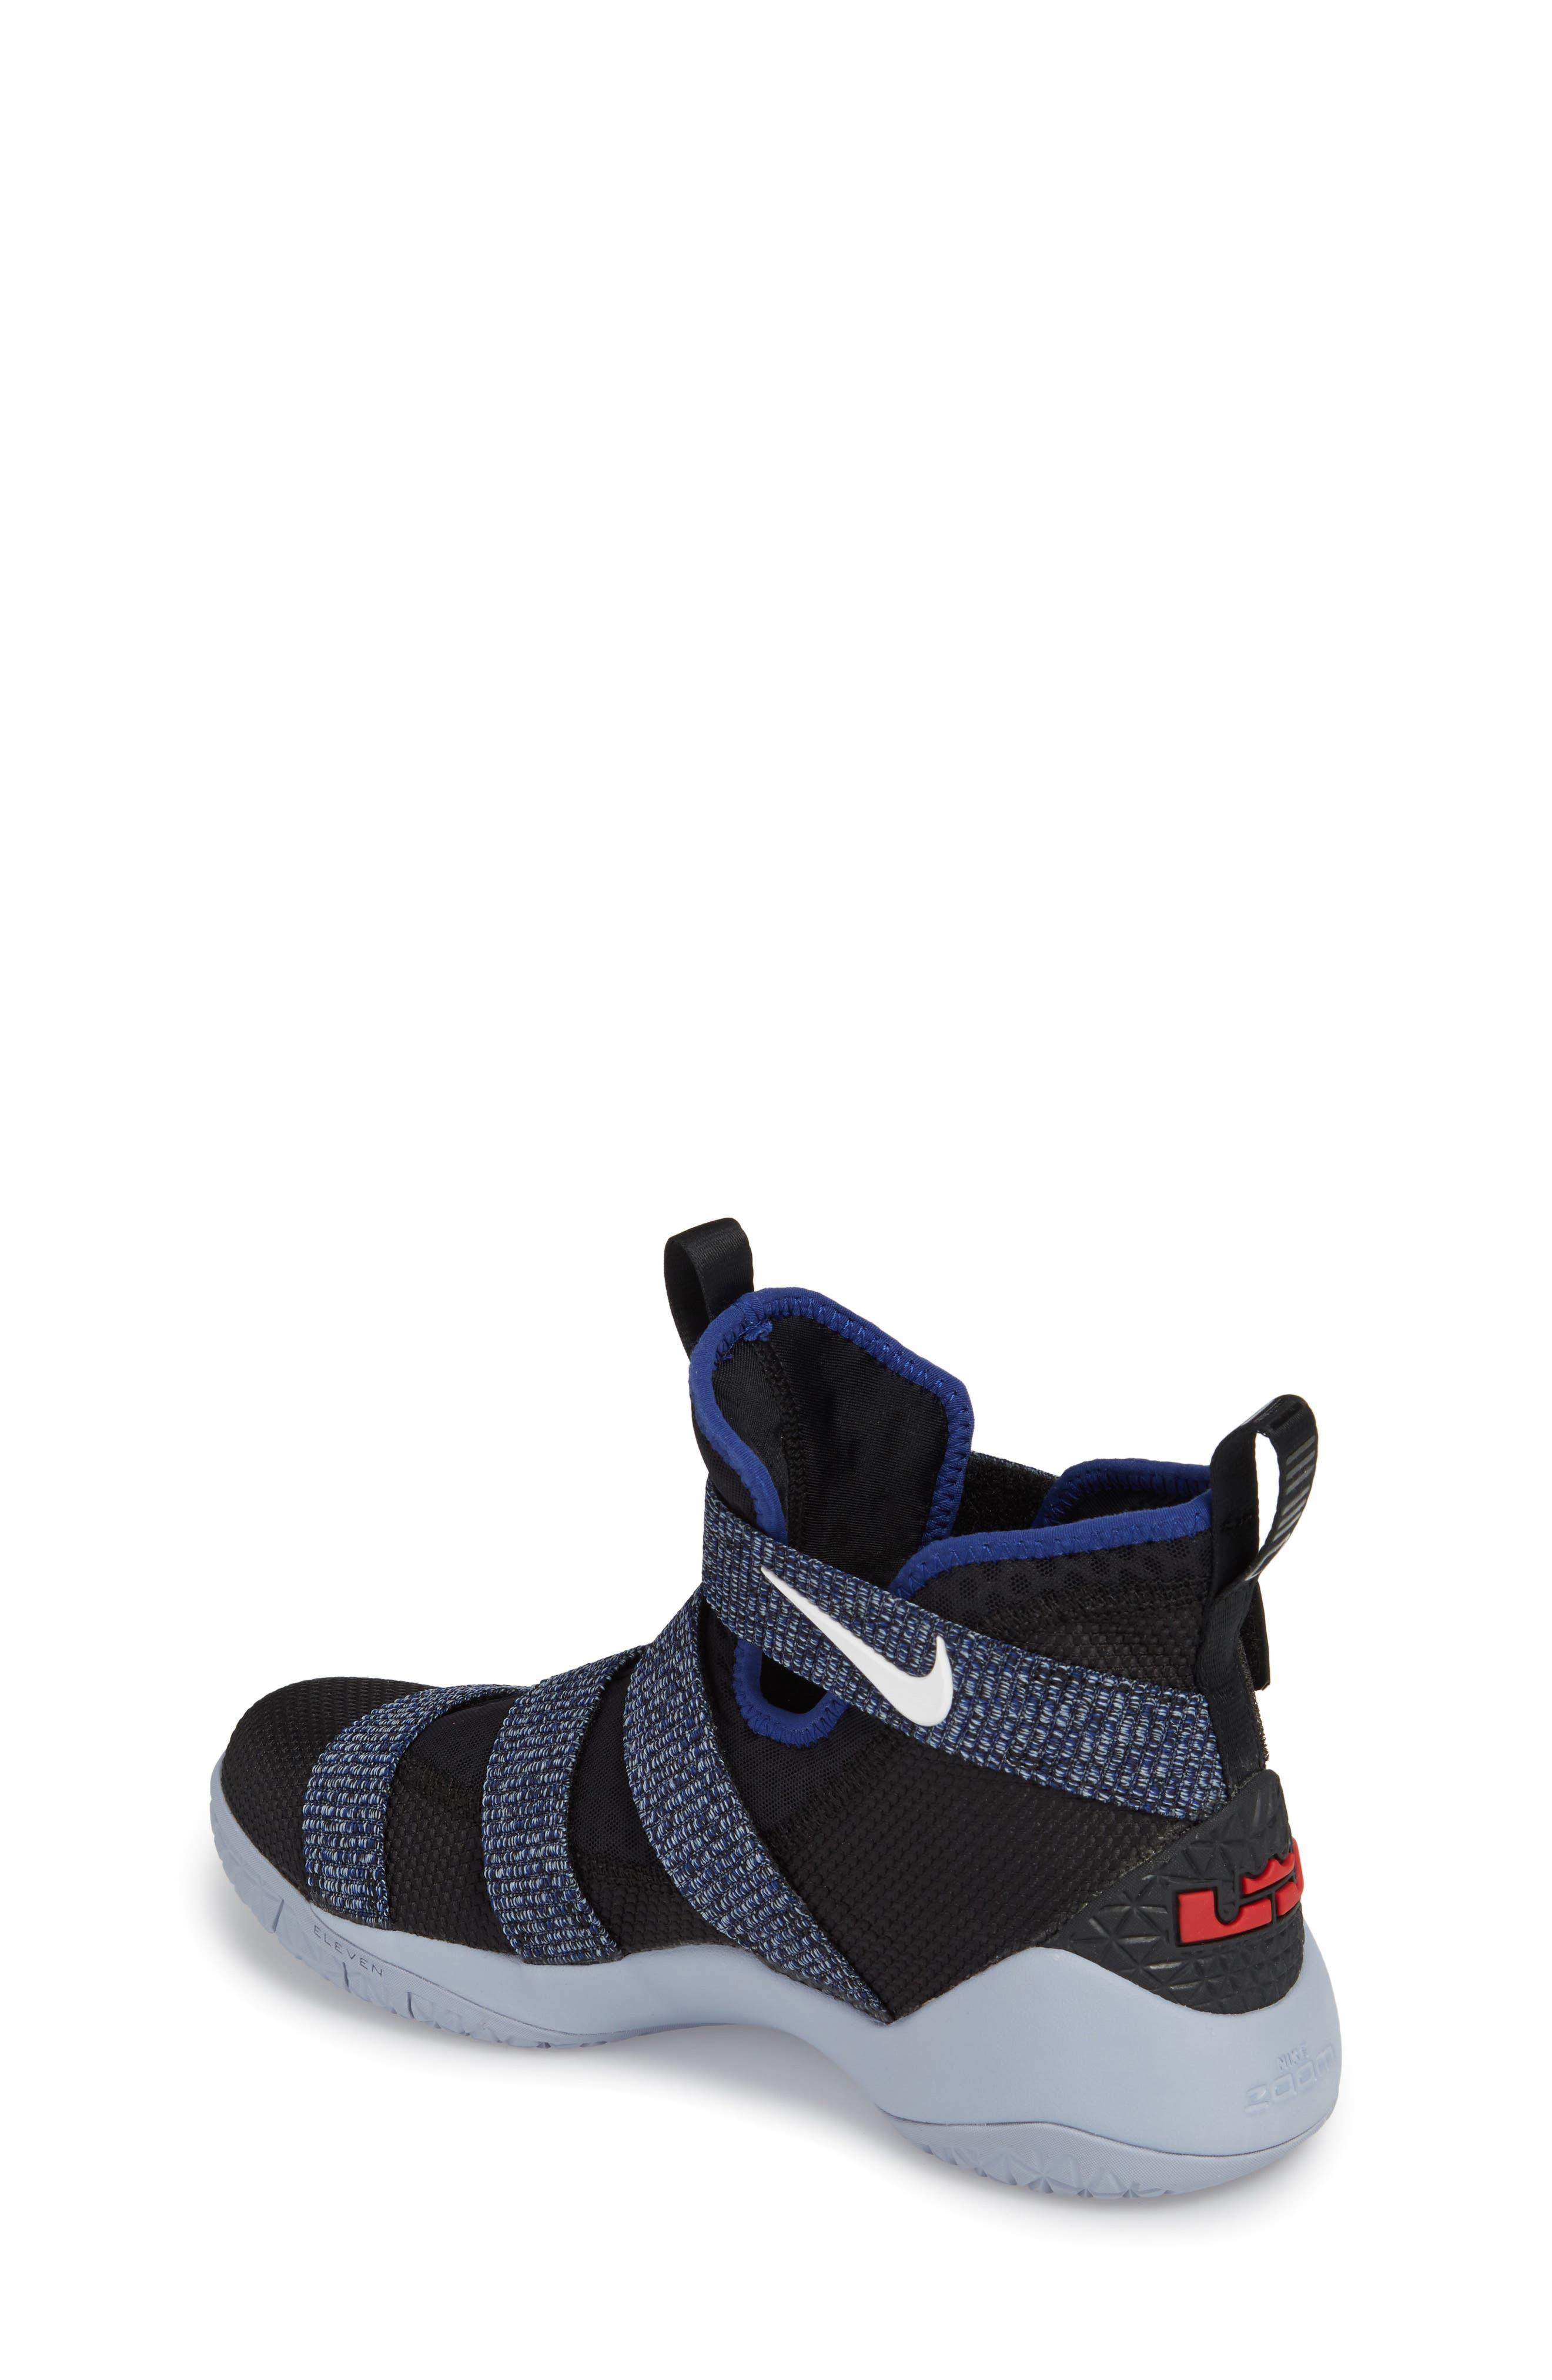 NIKE,                             LeBron Soldier XI Basketball Shoe,                             Alternate thumbnail 2, color,                             005